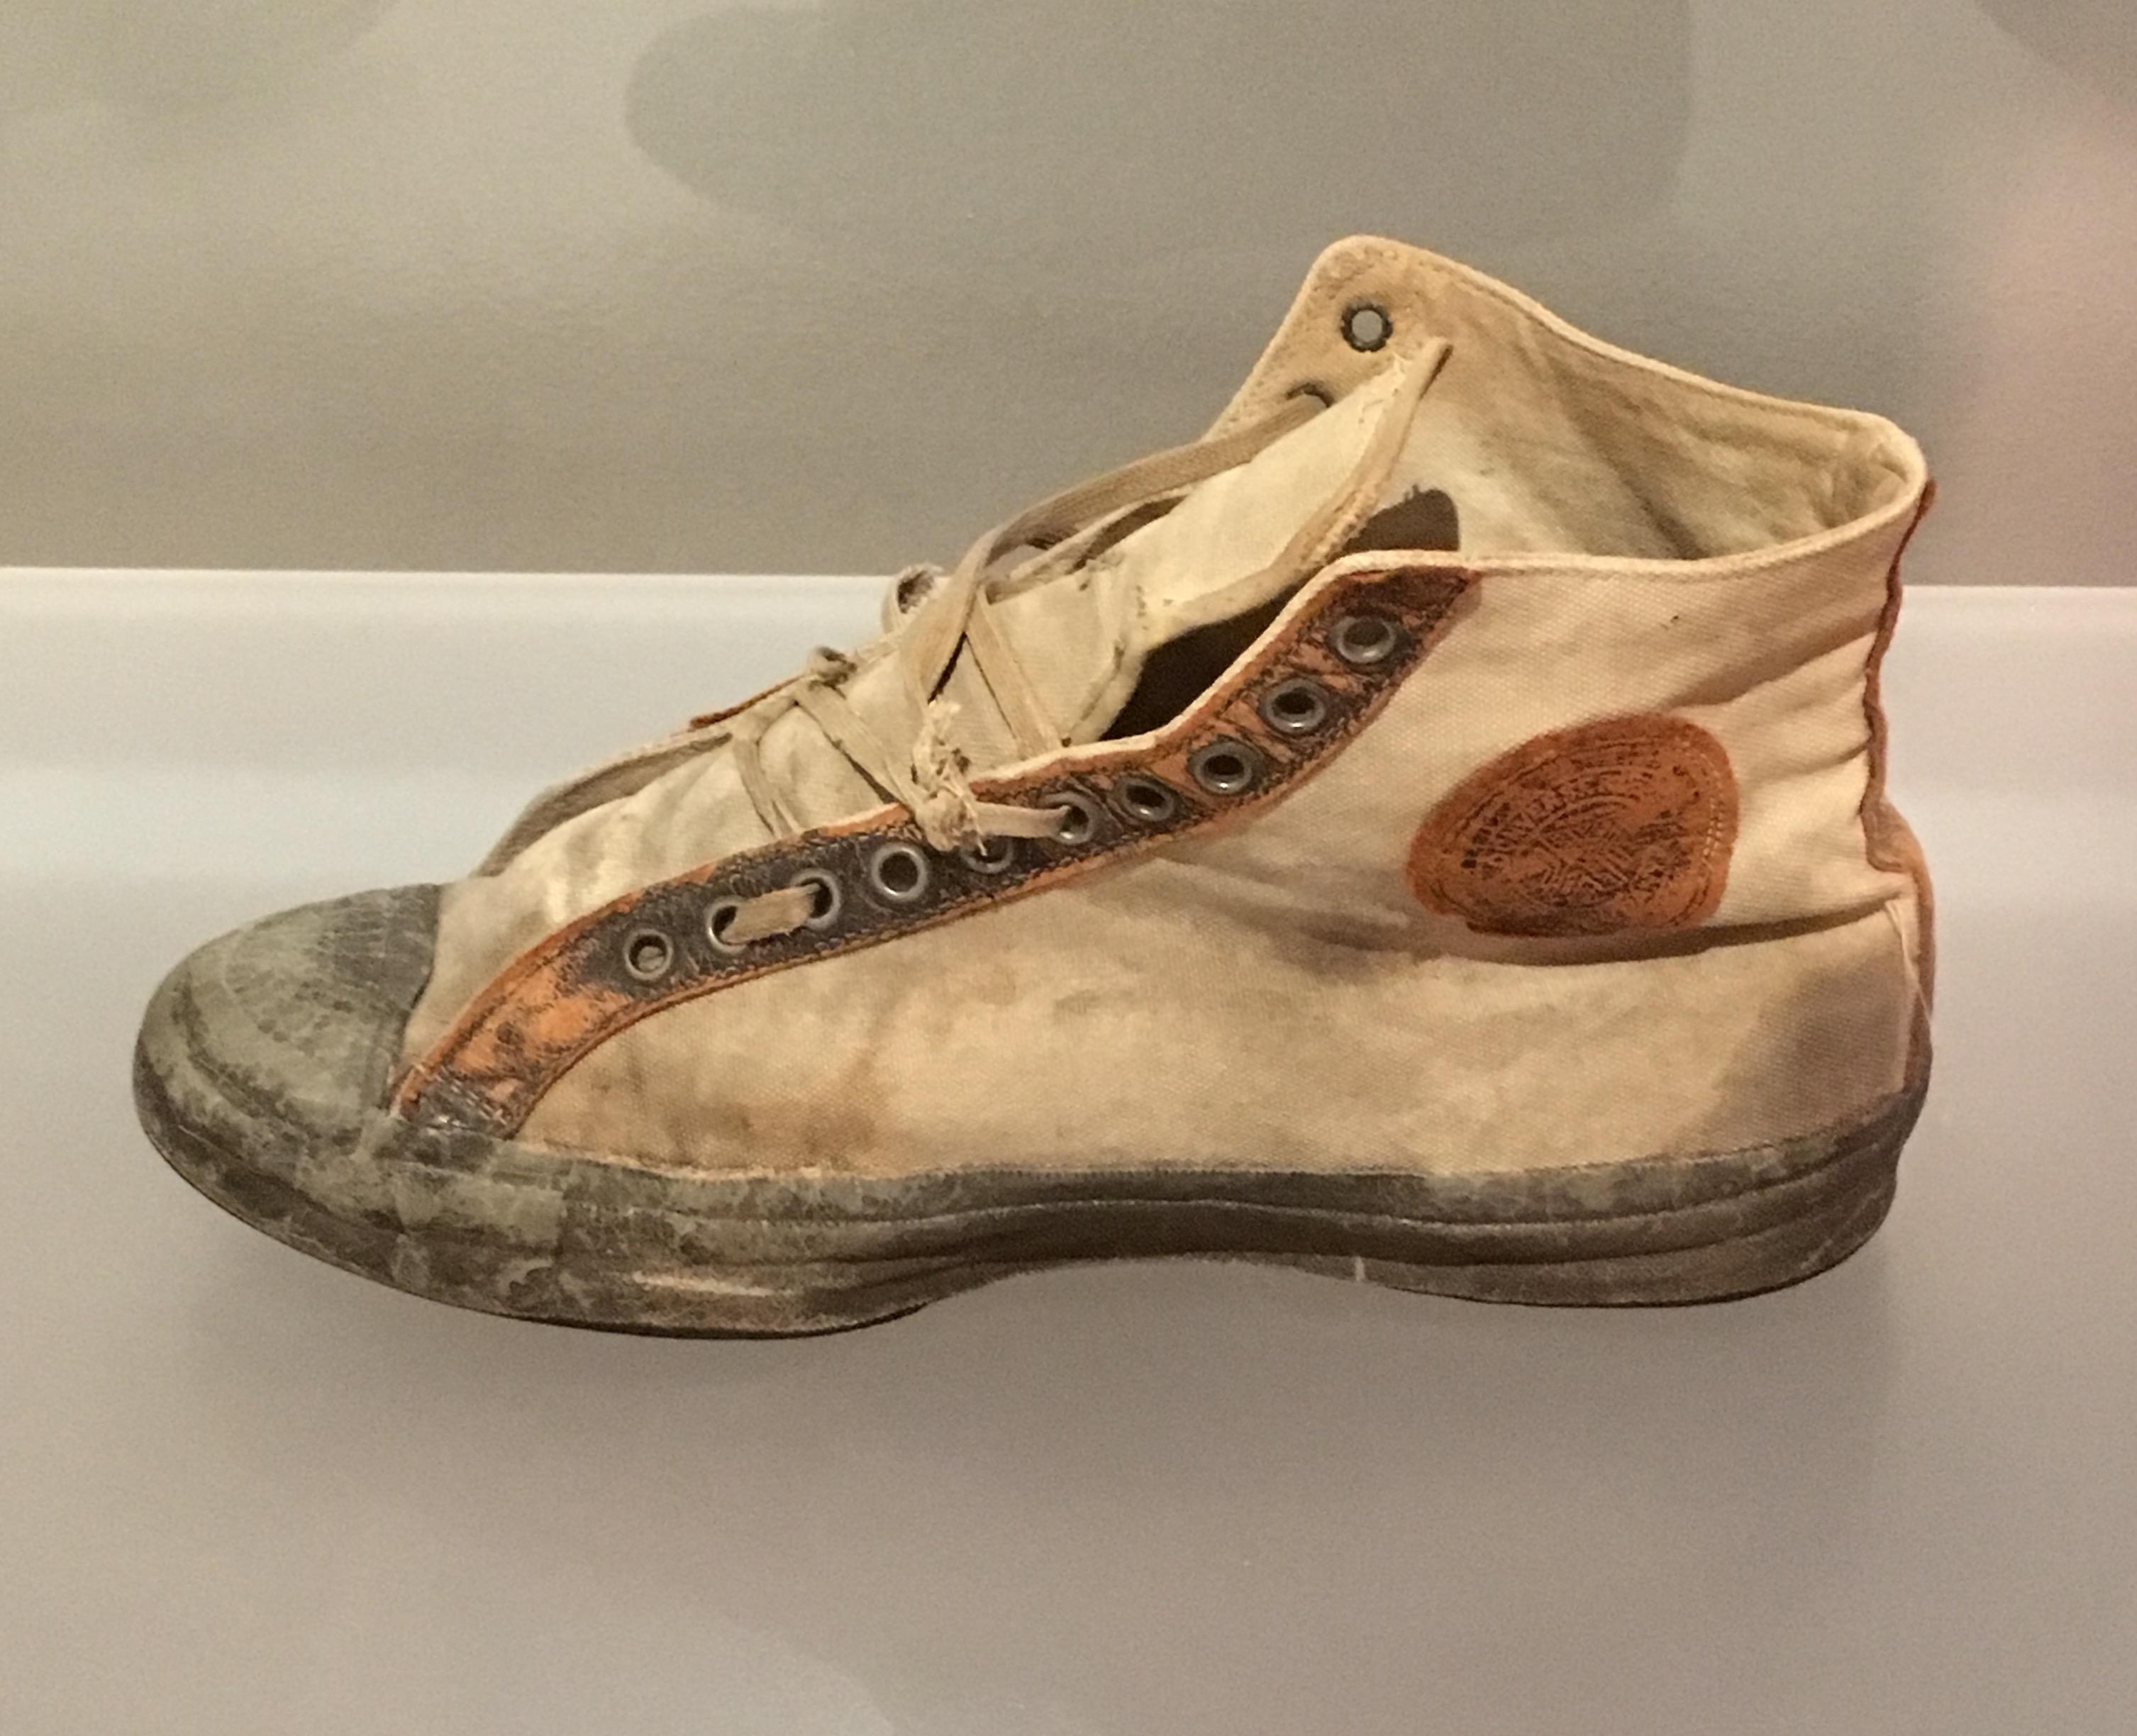 Air Jordans, Chuck Taylors and 'My